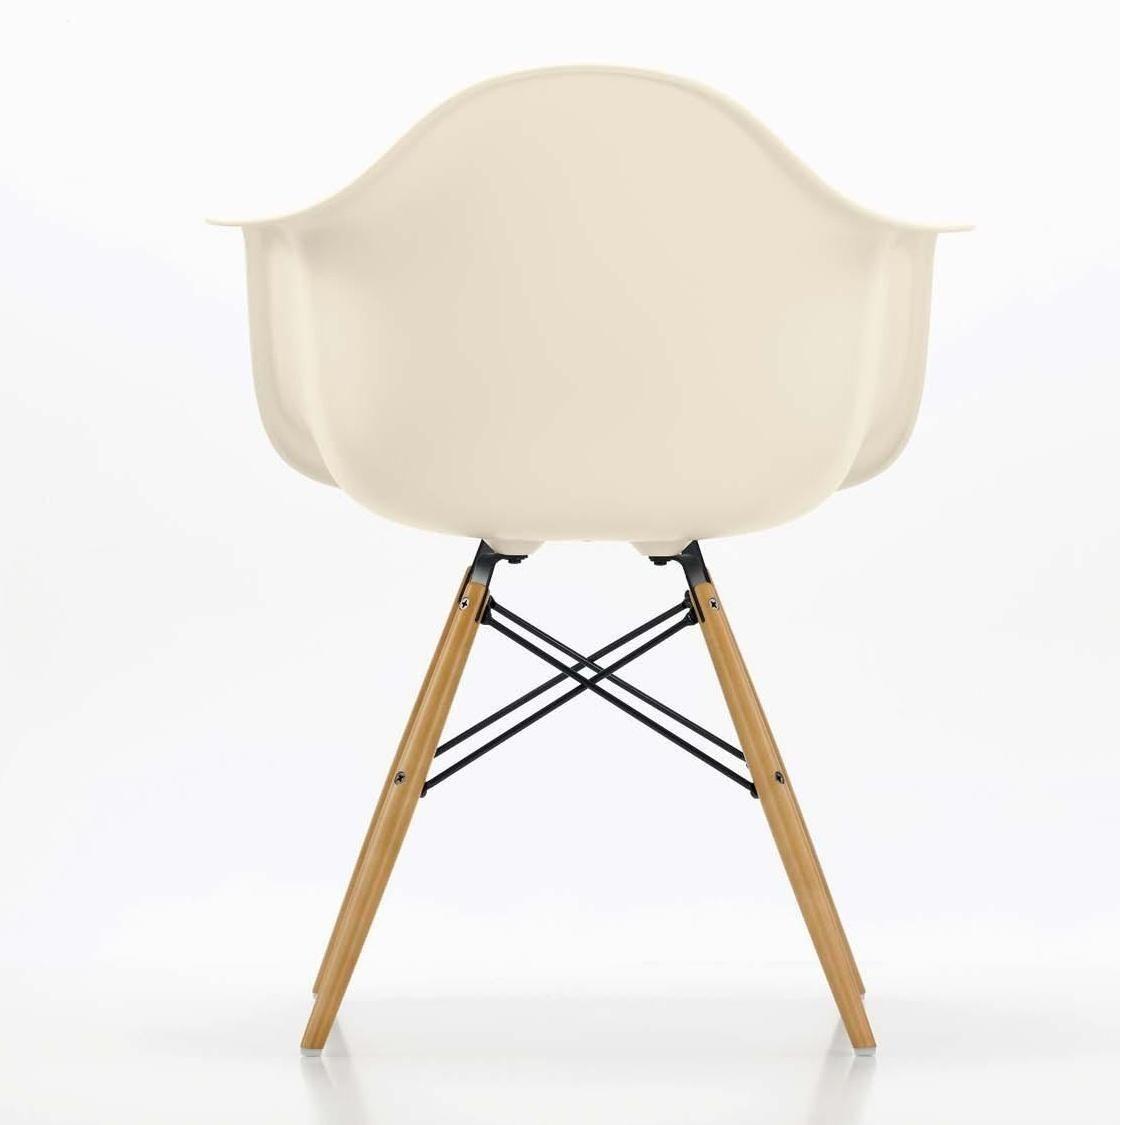 Eames plastic armchair daw armlehnstuhl h43cm vitra for Pool rund stahl